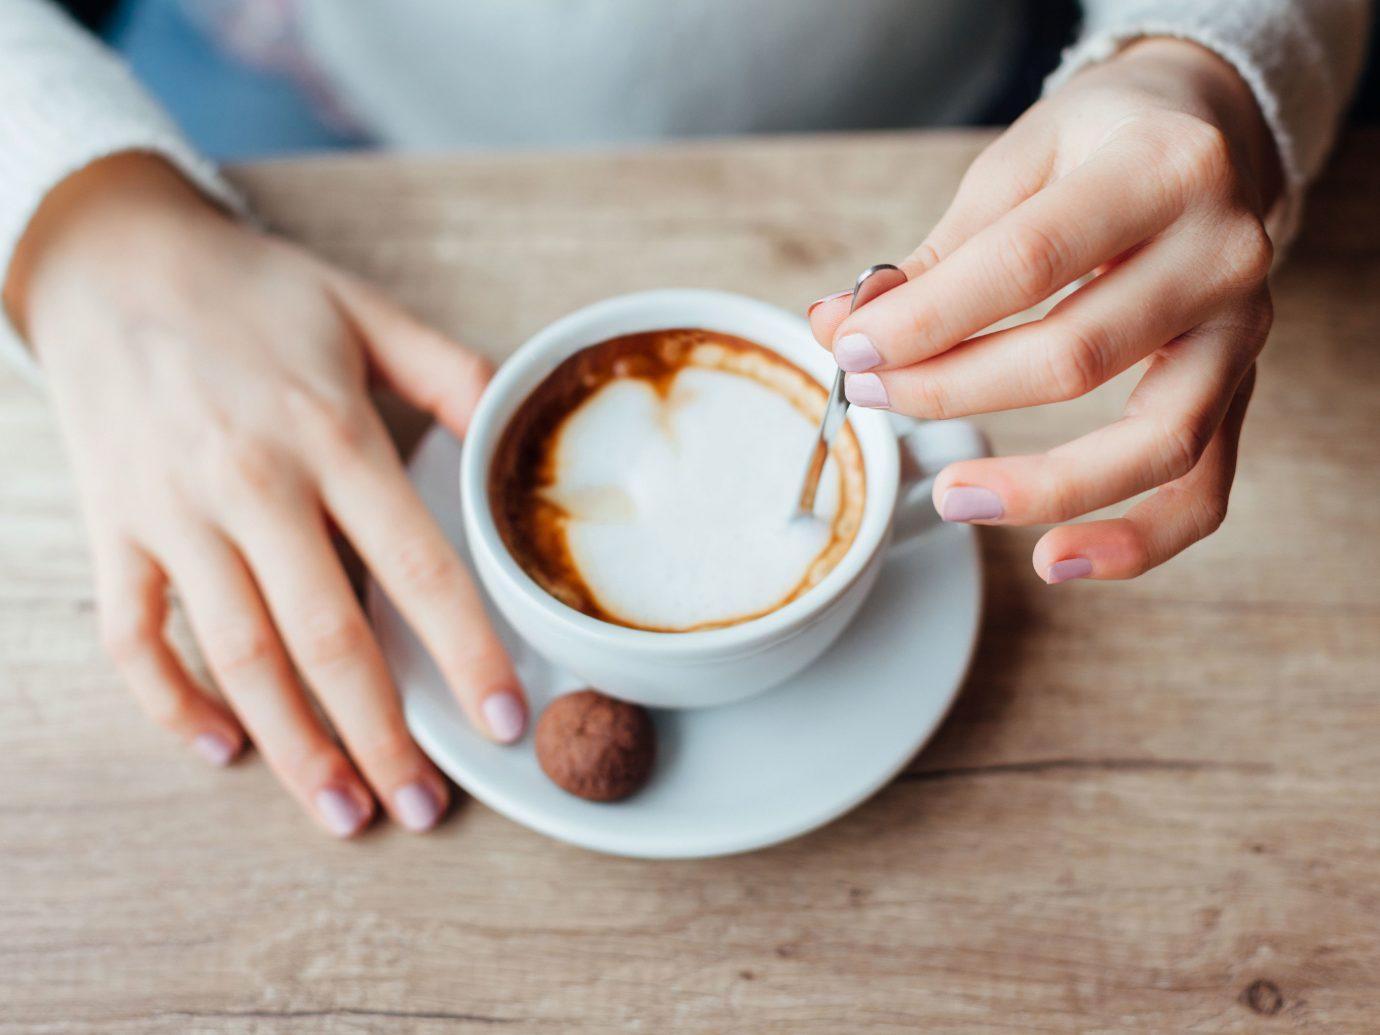 Trip Ideas person cup food Drink coffee cup wooden caffeine coffee espresso beverage hand flavor